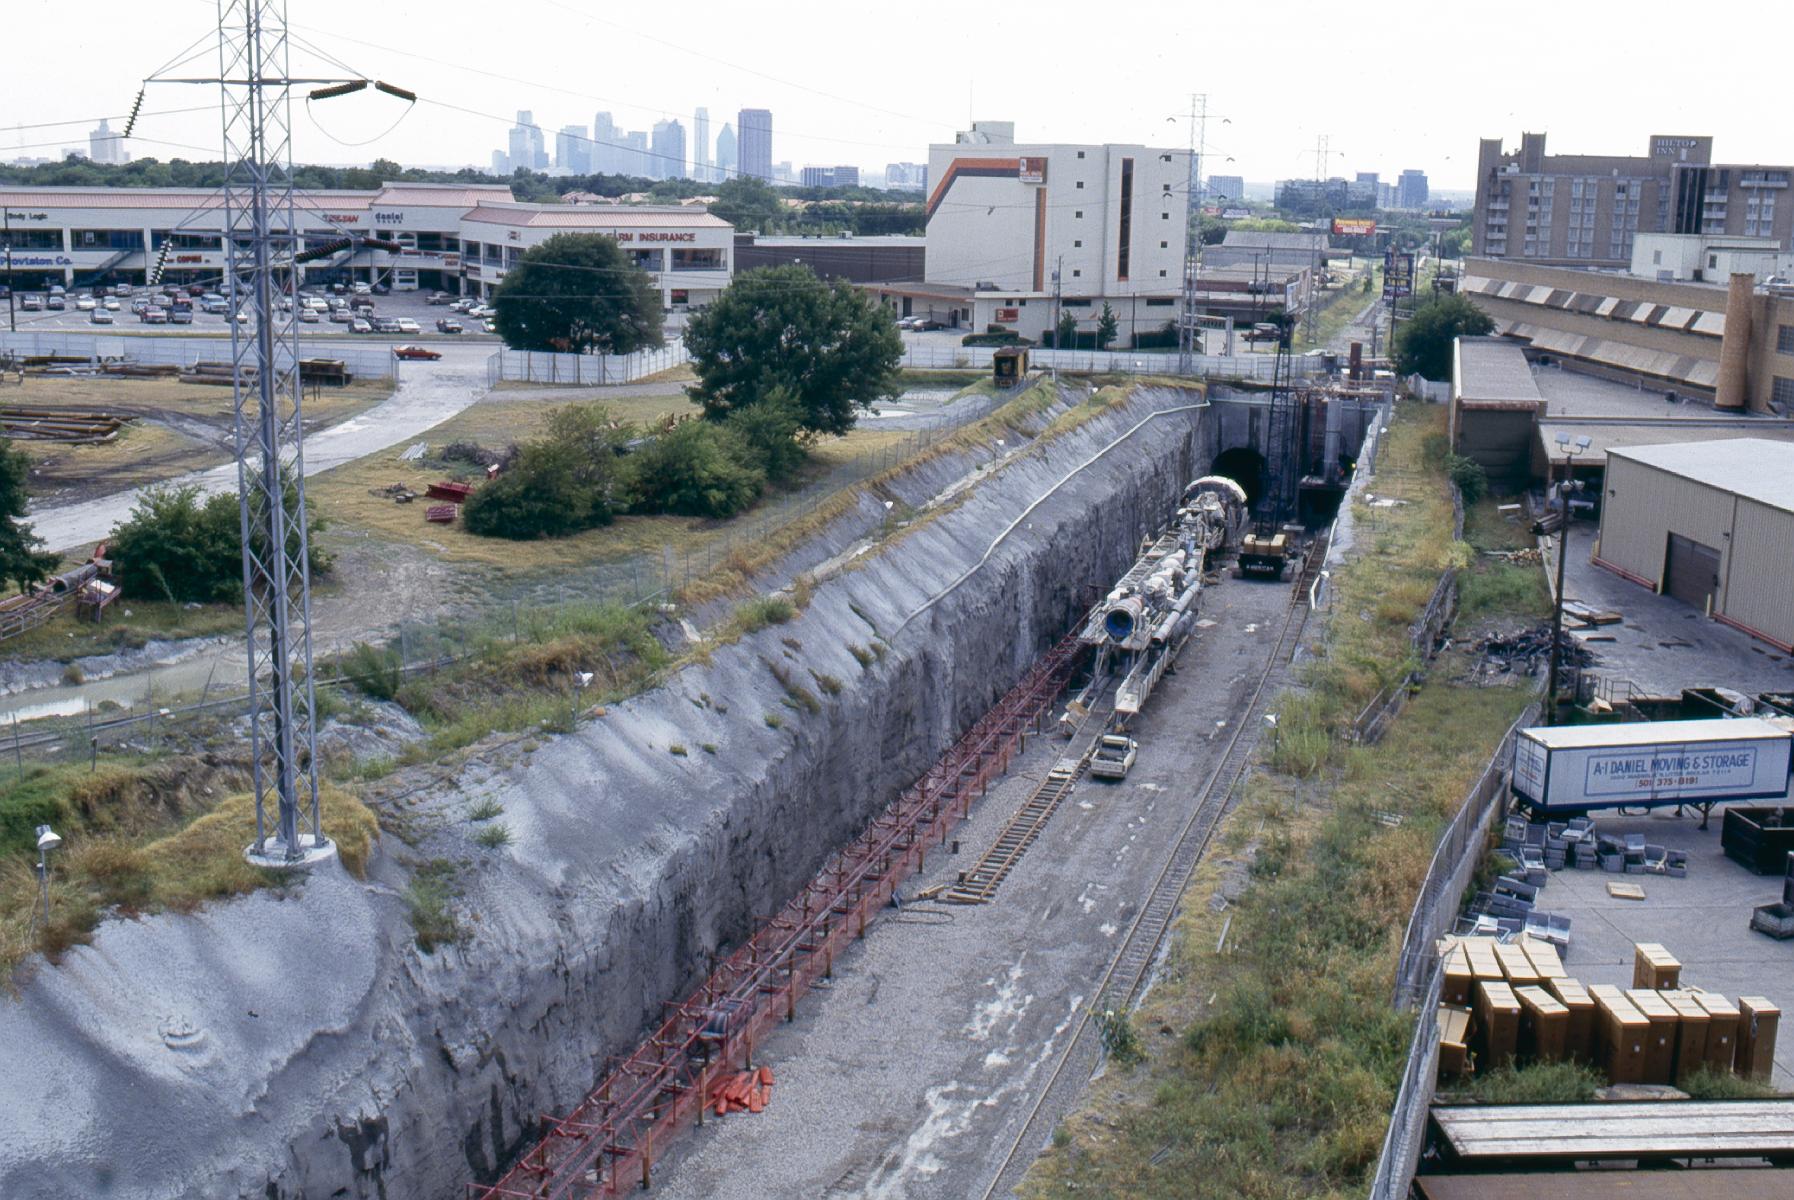 DART SMU Mockingbird Station and tunnel construction